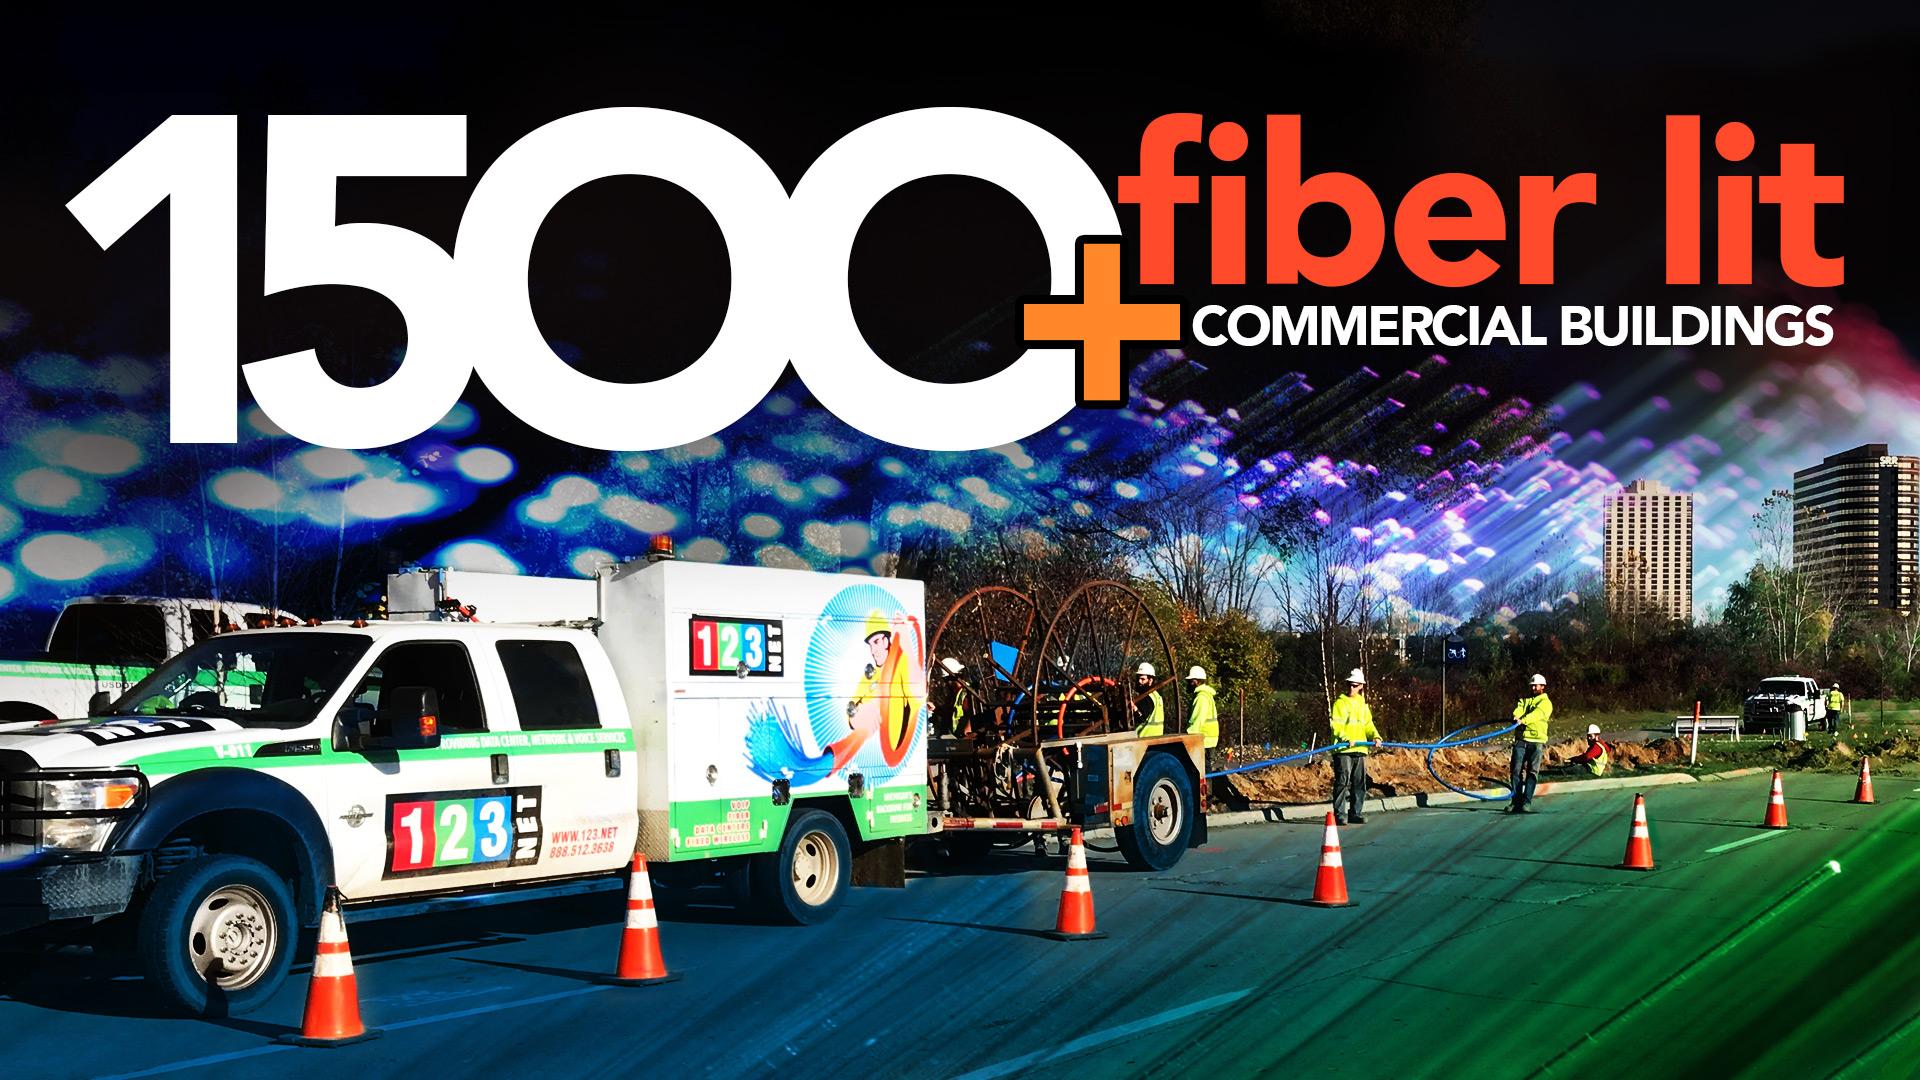 123NET Reaches the 1,500th Fiber Lit Commercial Building Milestone